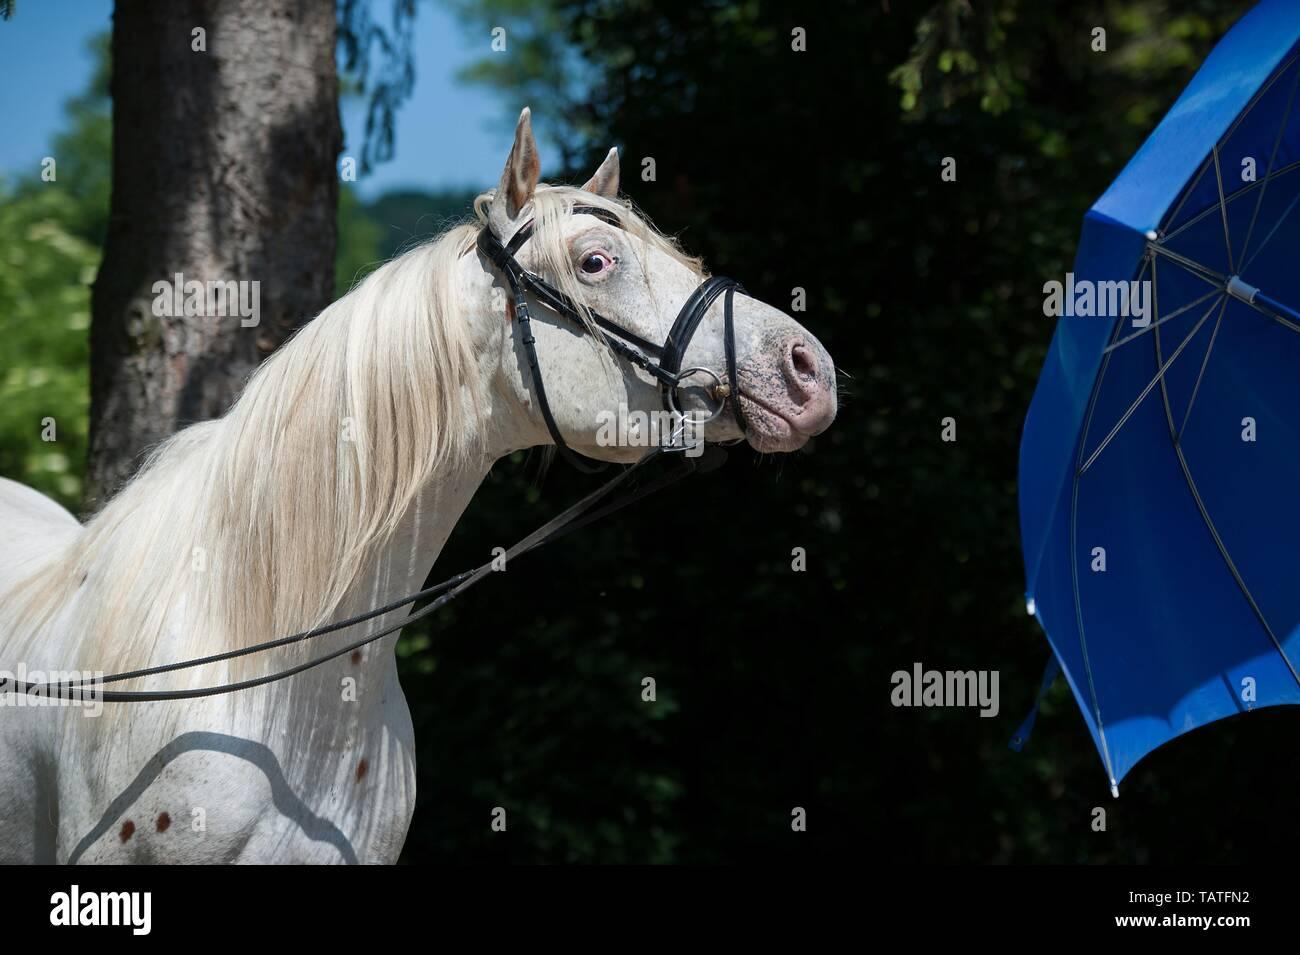 Knabstrup Horse Portrait - Stock Image